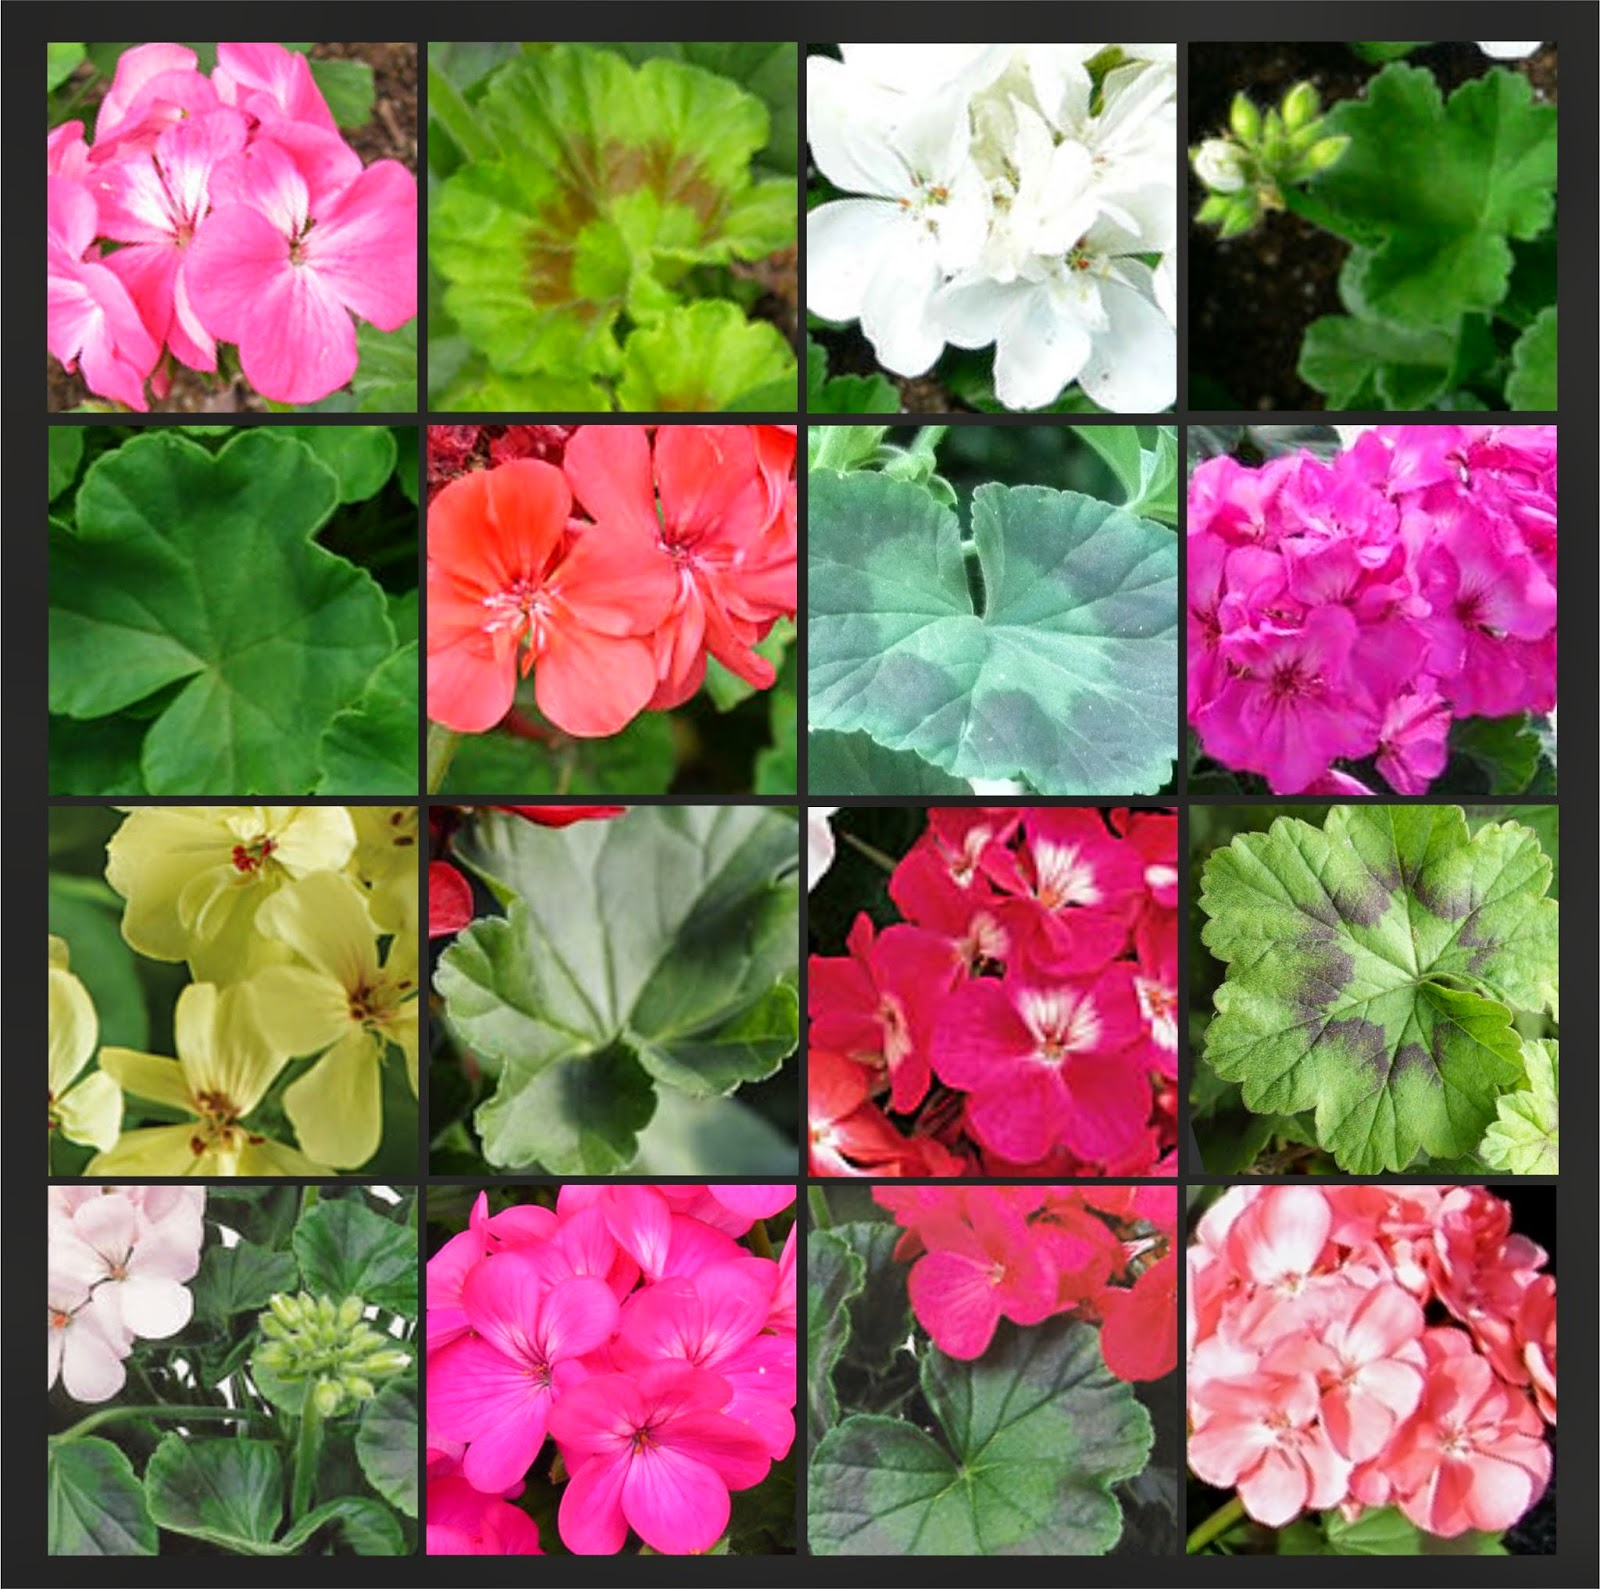 V e r d e c h a c o agosto 2014 for 6 plantas ornamentales